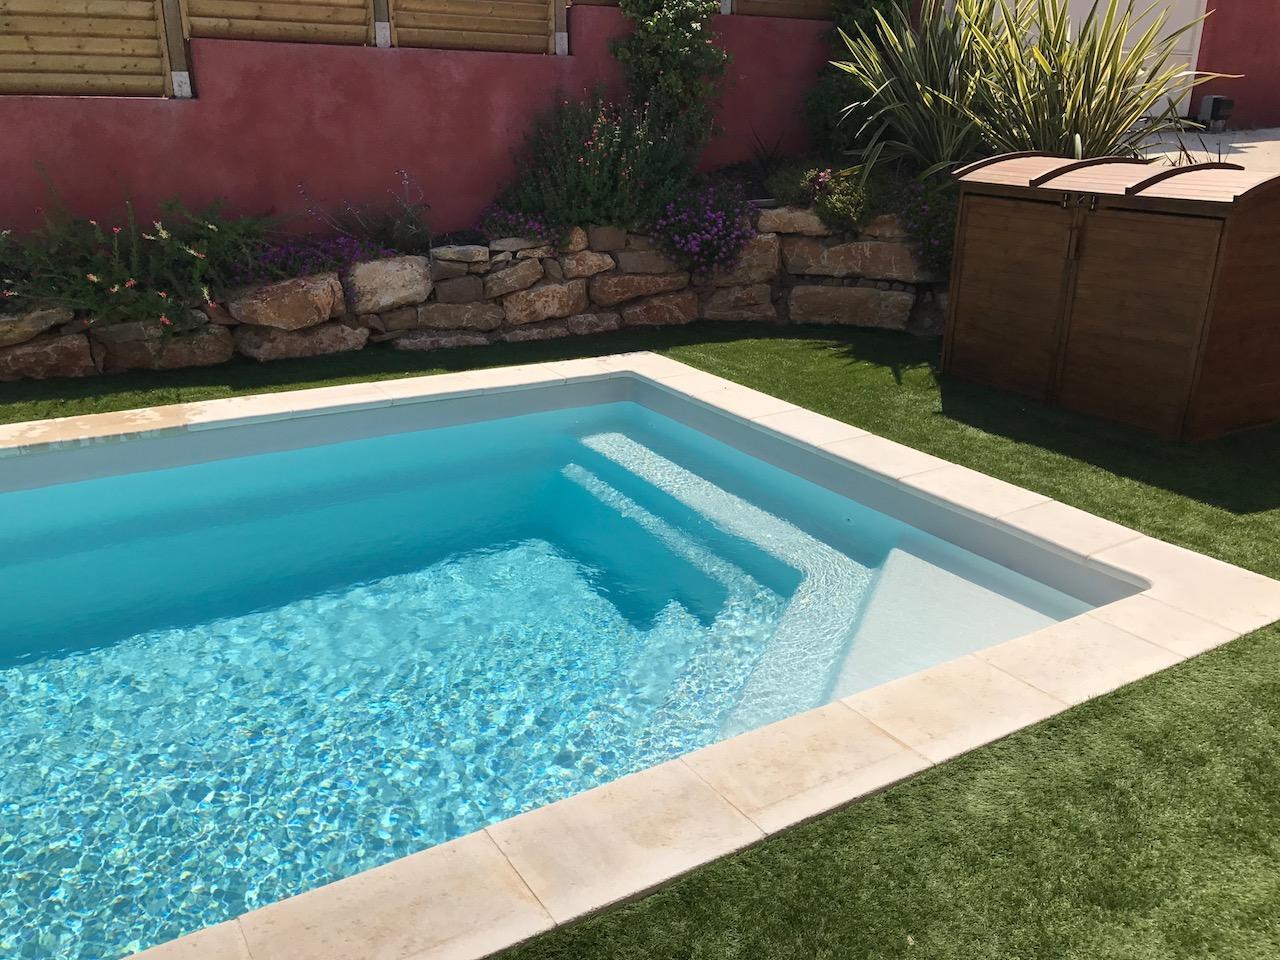 installation piscine celestine 7 et plage bois gazon sur. Black Bedroom Furniture Sets. Home Design Ideas